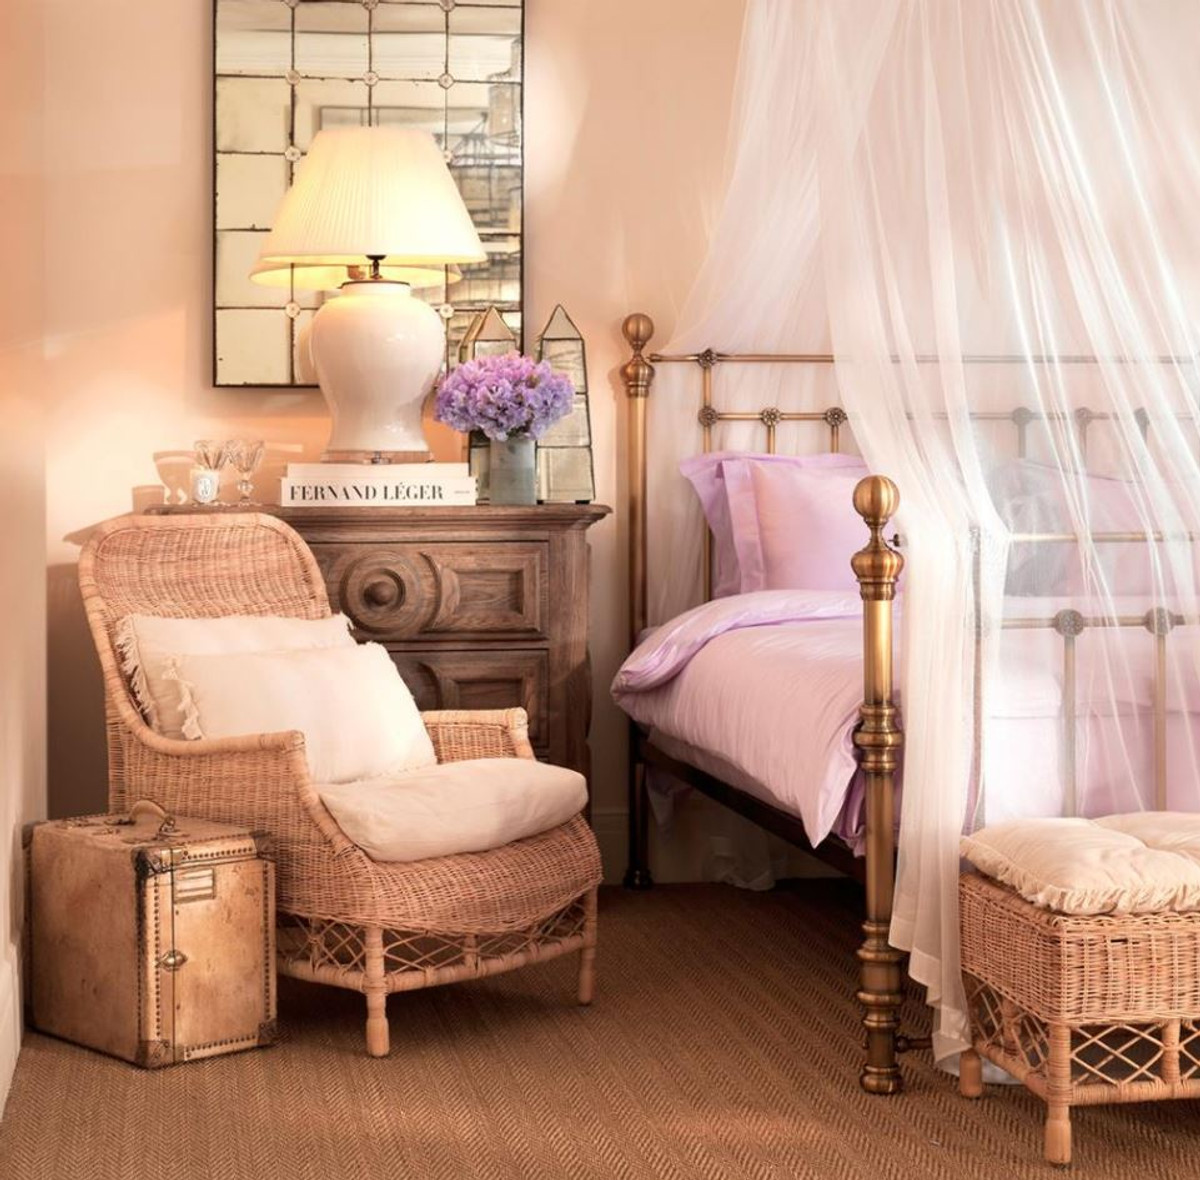 Casa Padrino Luxus Bett Antik Messing 187 x 225,5 x H. 152,5 cm - Designer Möbel 6